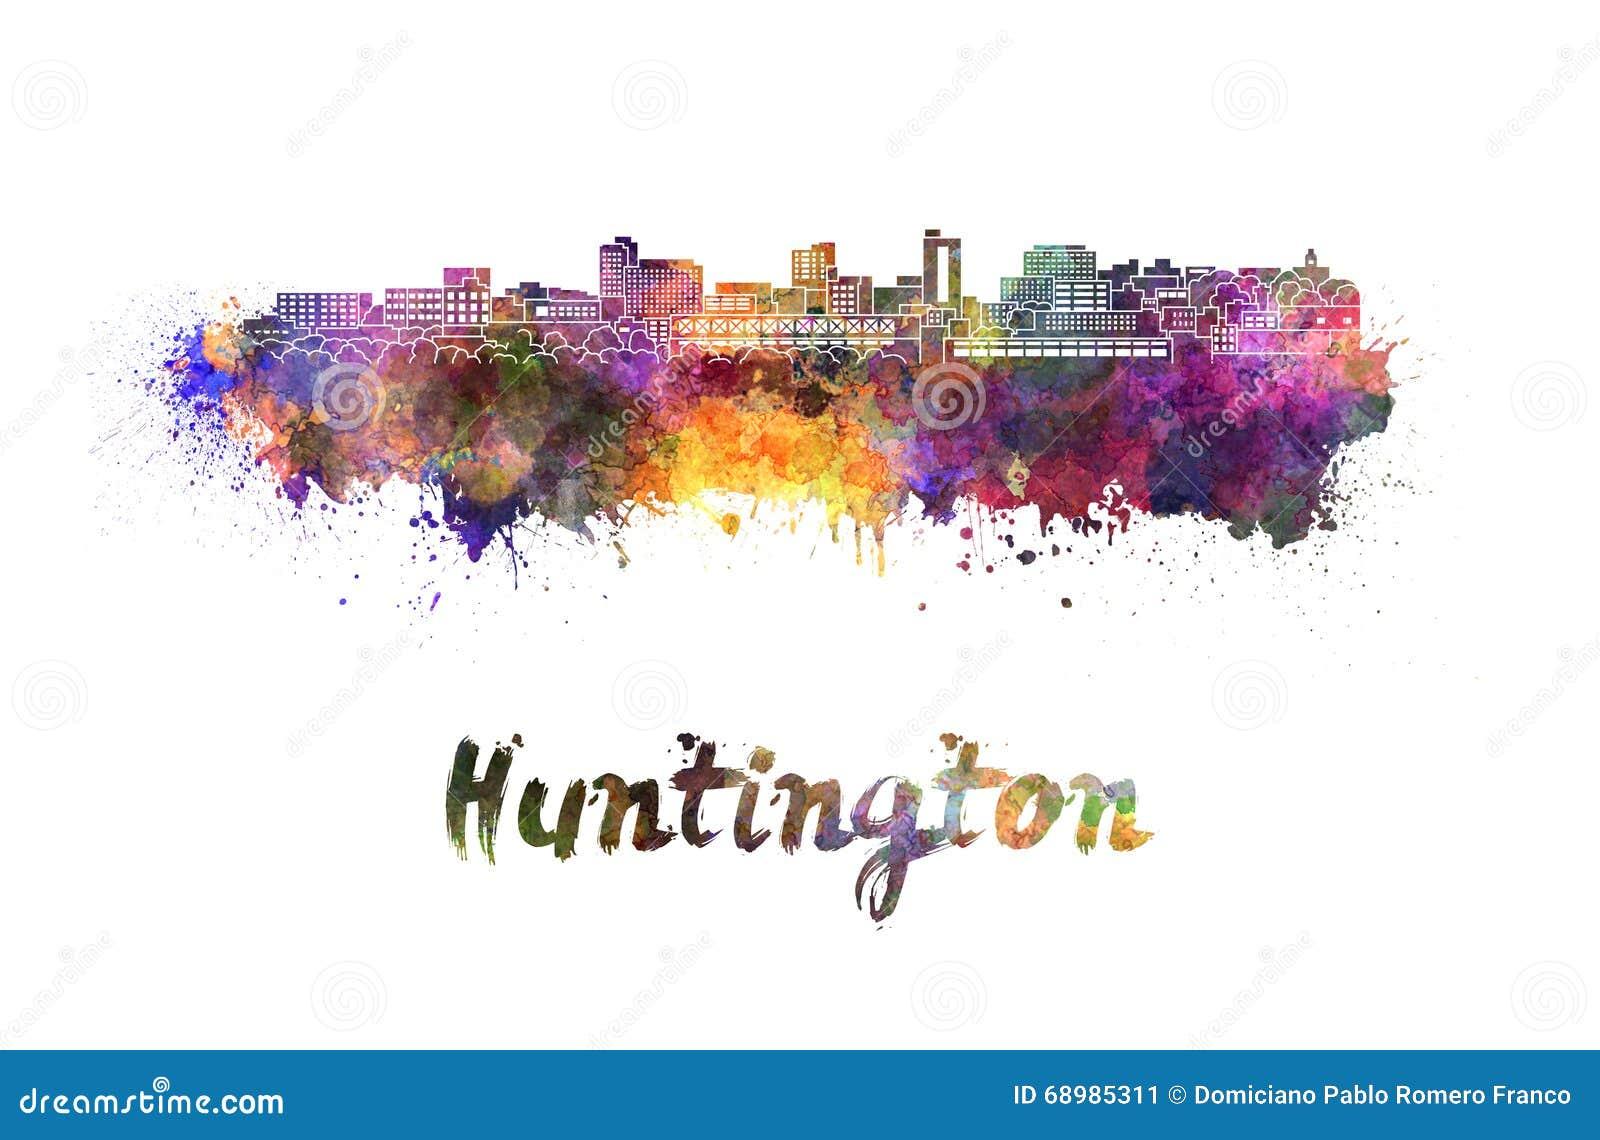 Horizonte de Huntington en acuarela